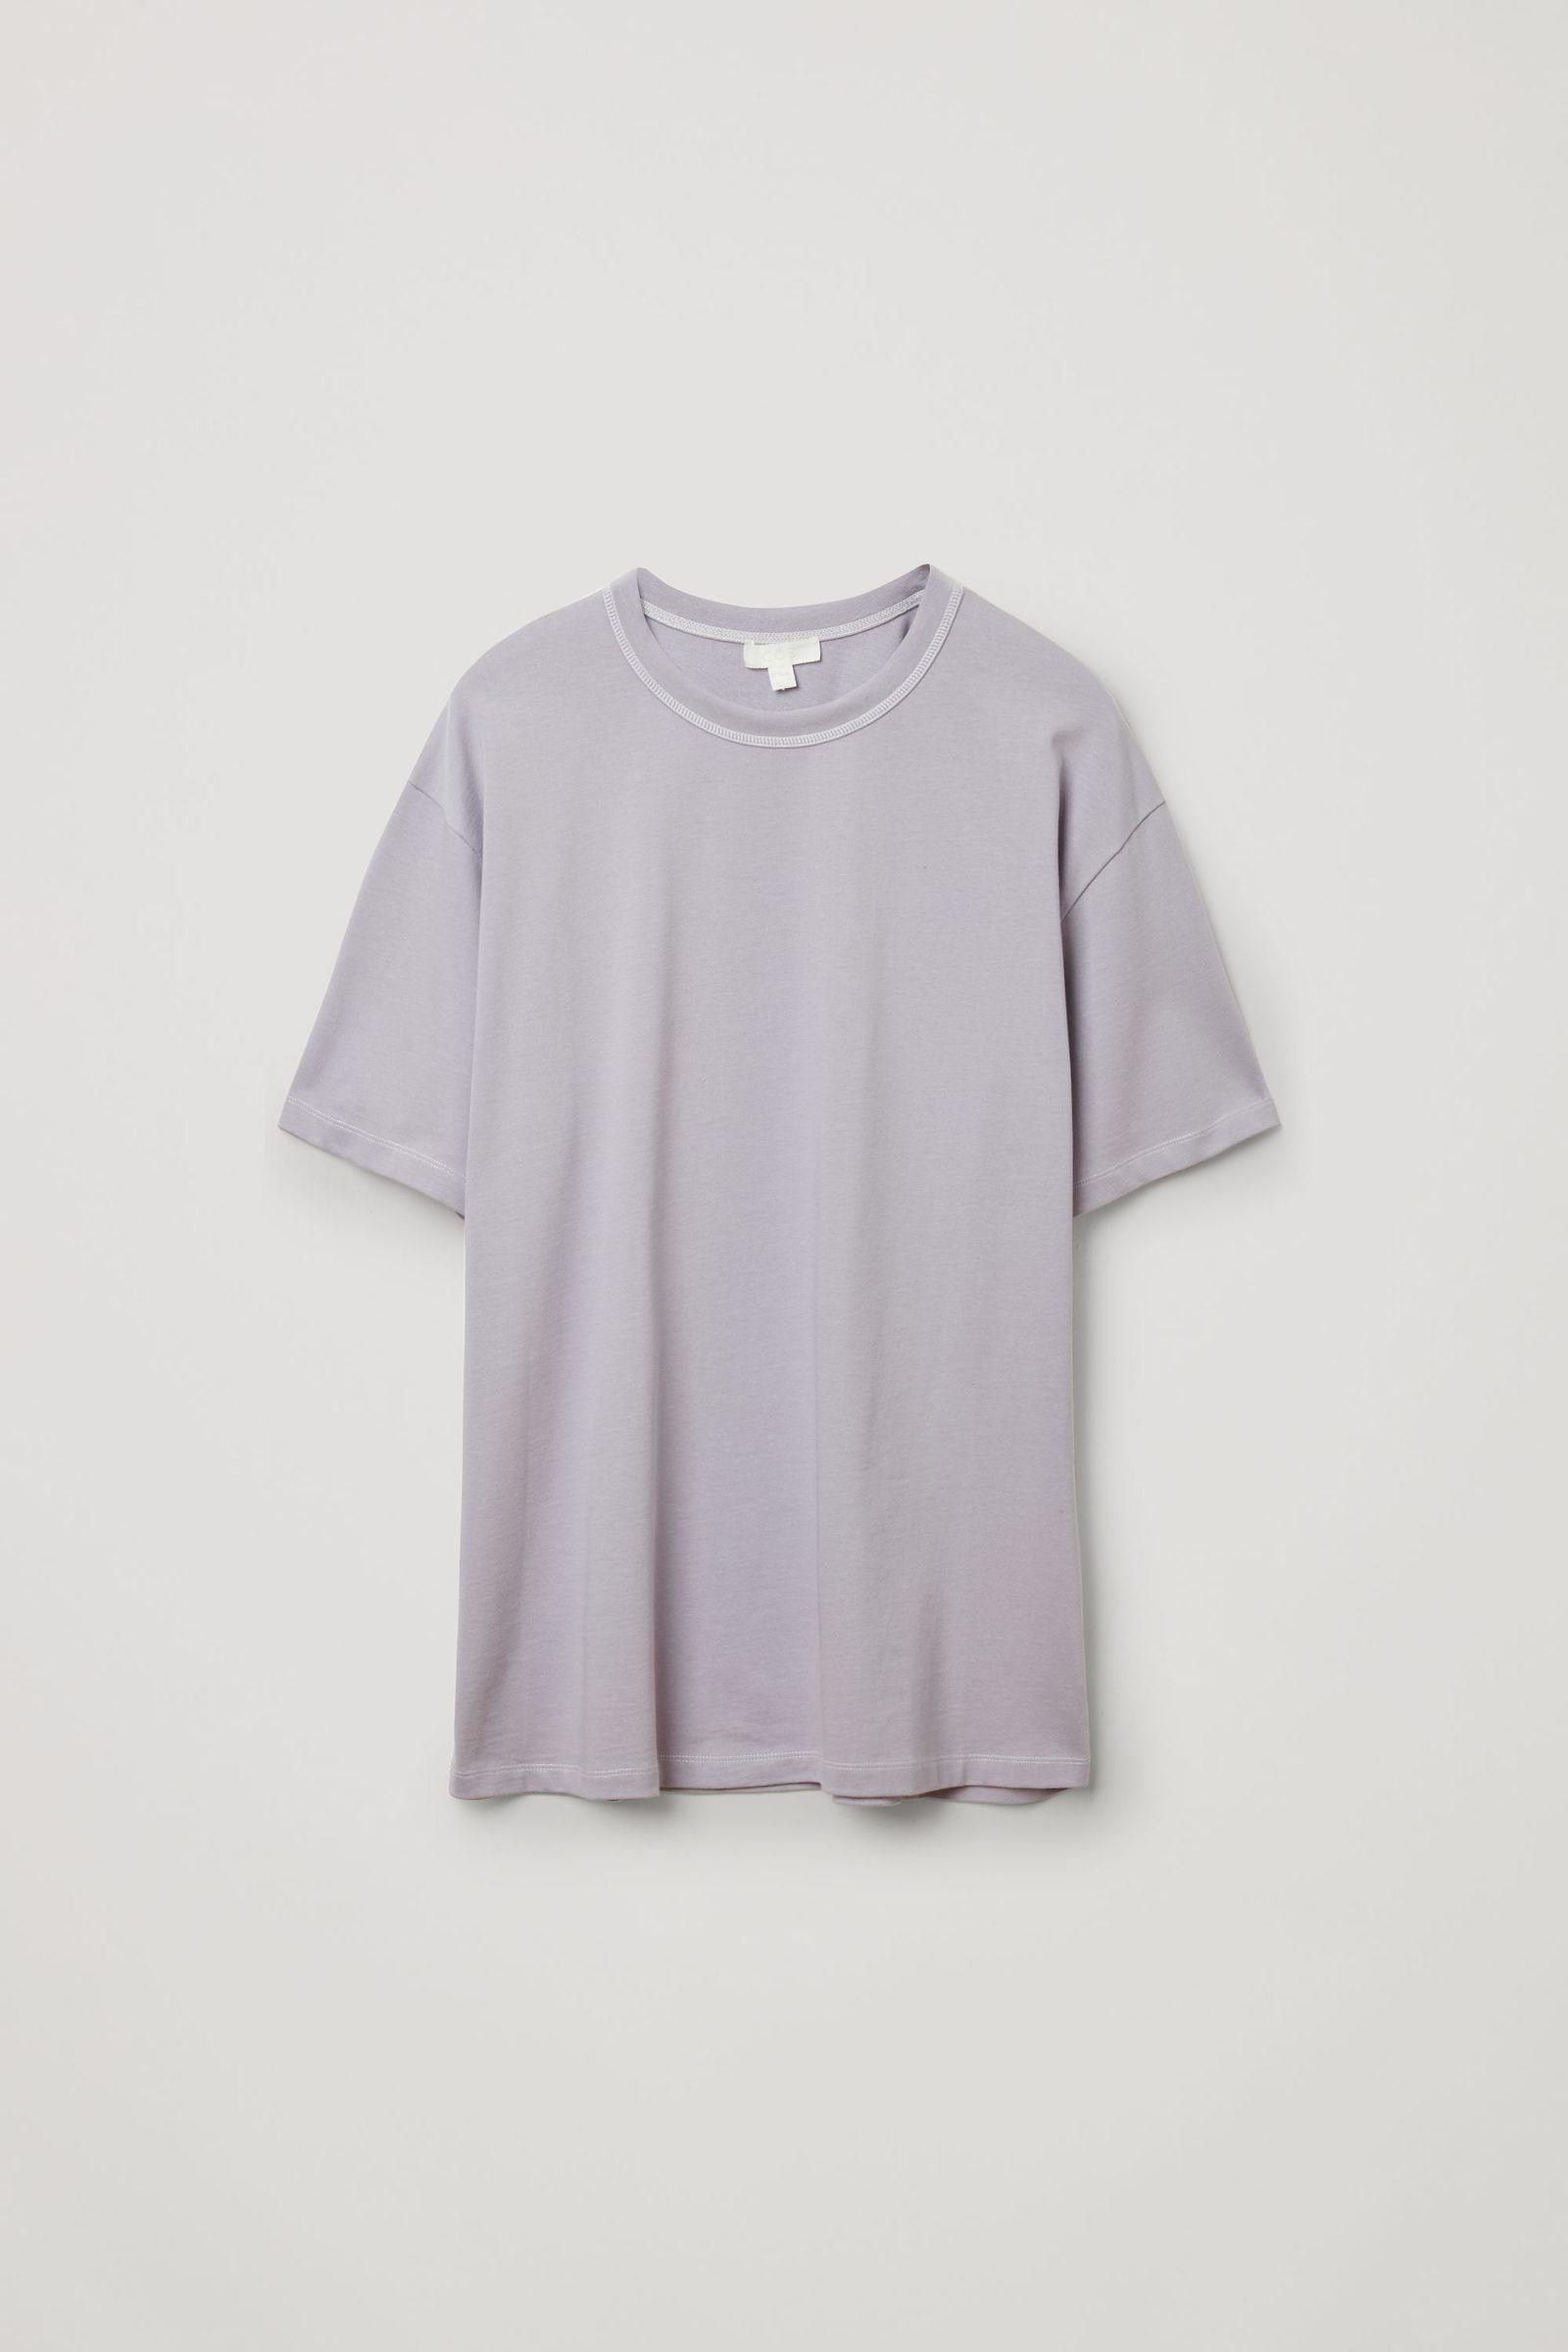 COS 롱 코튼 티셔츠의 라이트 라일락컬러 Product입니다.